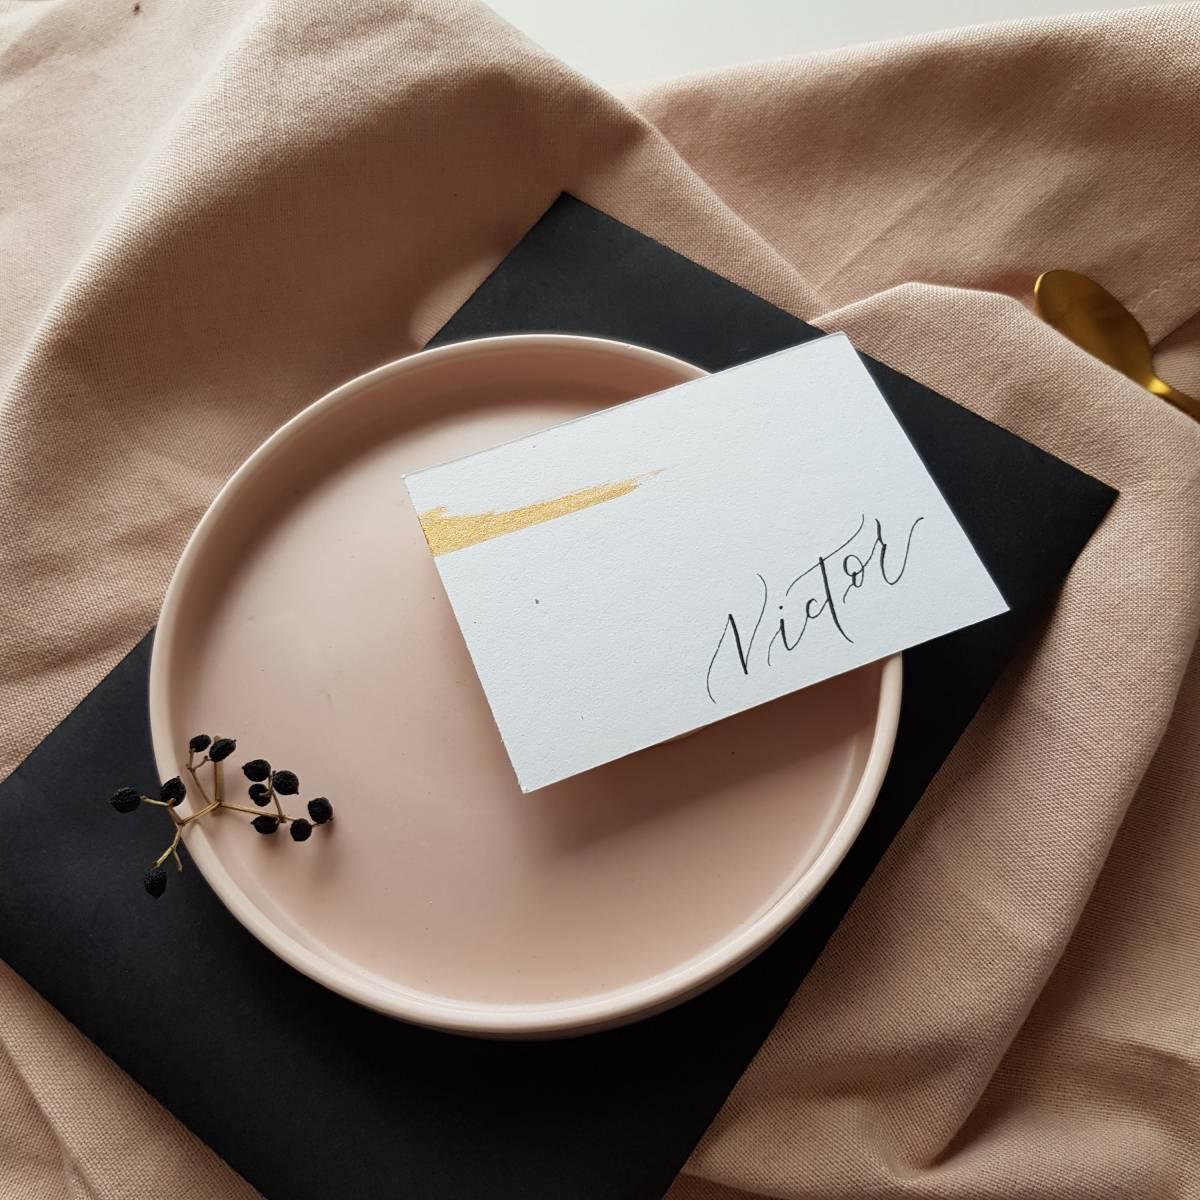 Touch of Gold - Trouwuitnodiging - Huwelijksuitnodiging - Kalligrafie - House of Weddings - 22